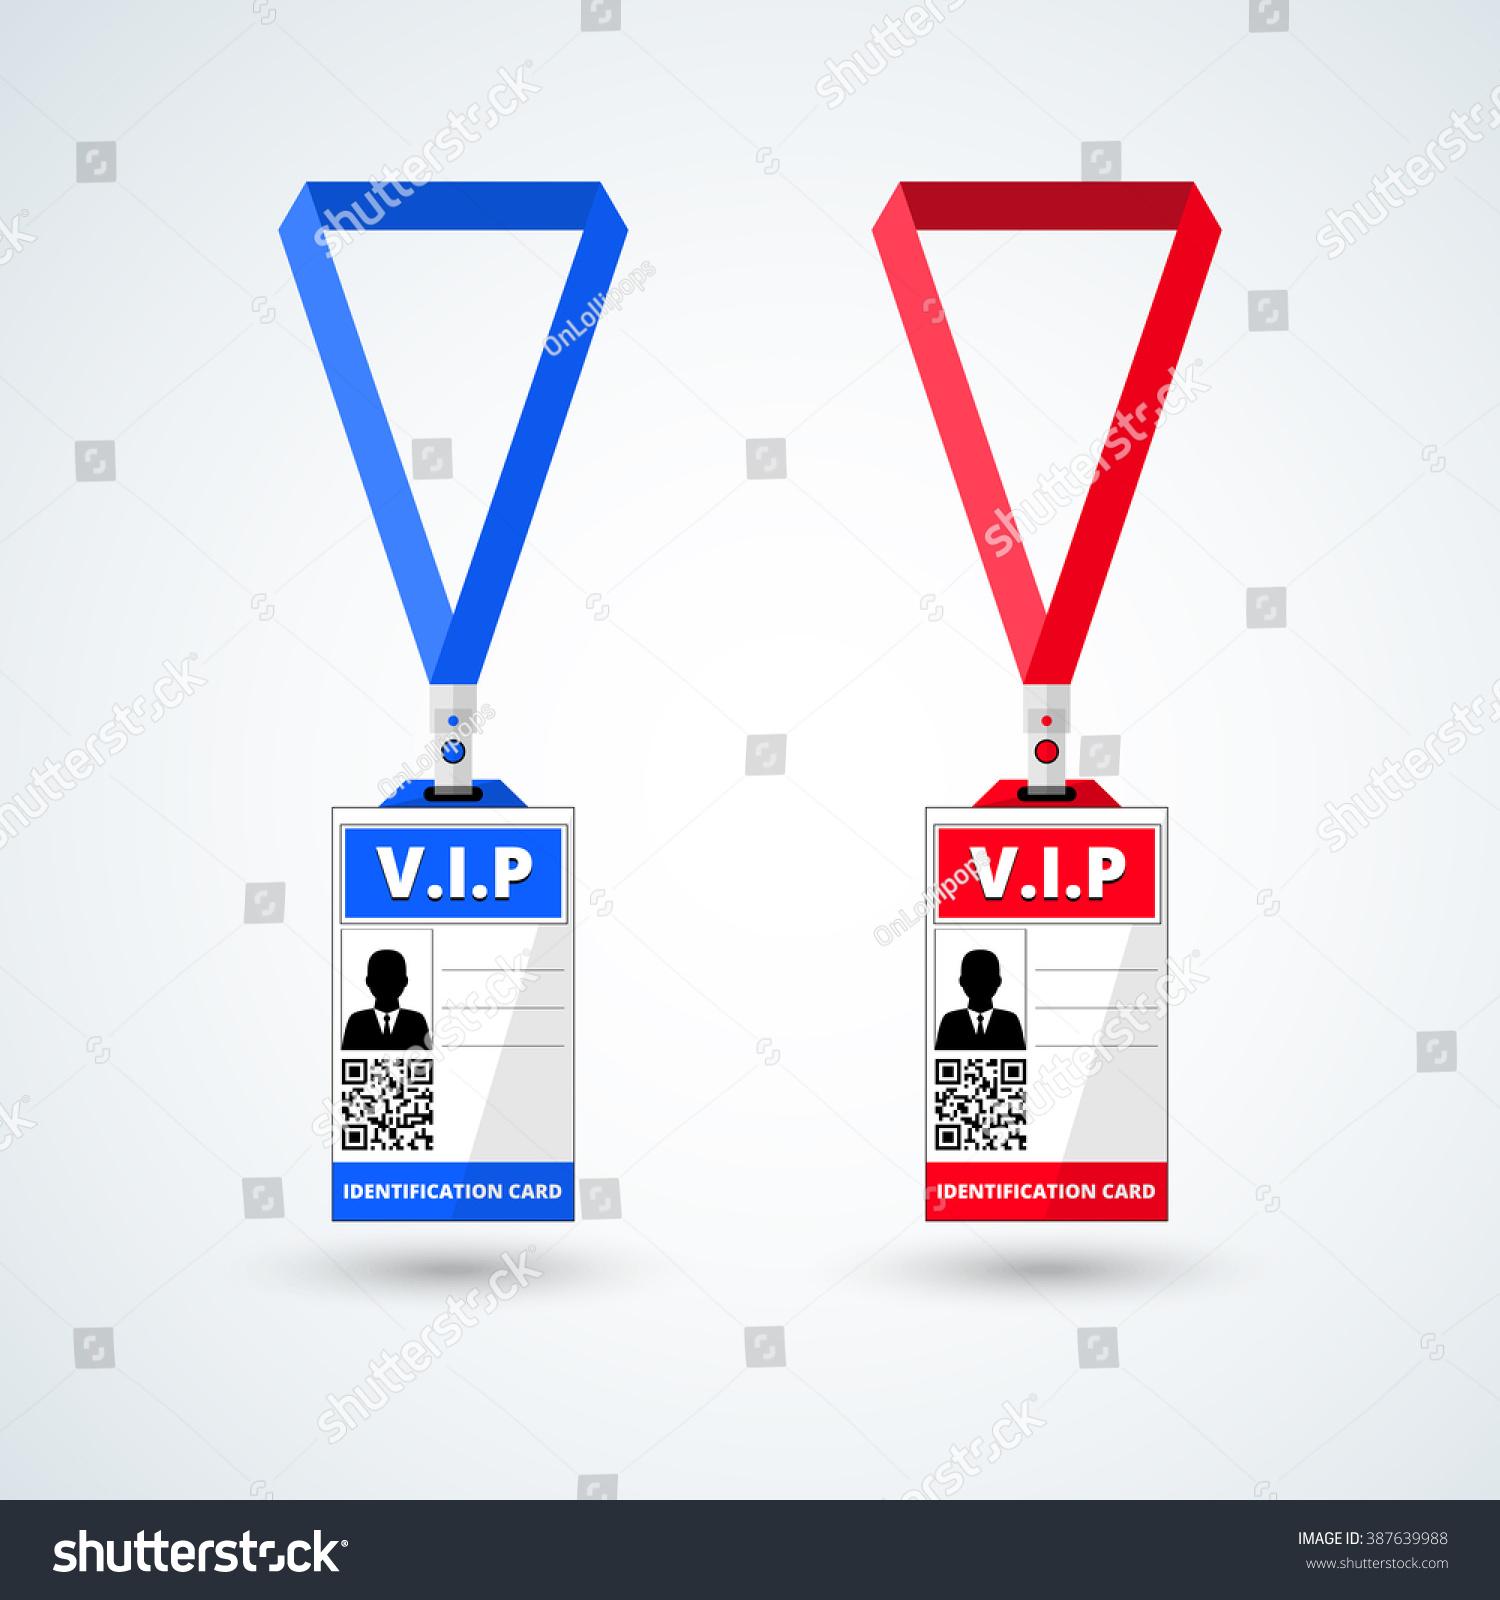 id card vip lanyard set vector stock vector 387639988 shutterstock. Black Bedroom Furniture Sets. Home Design Ideas